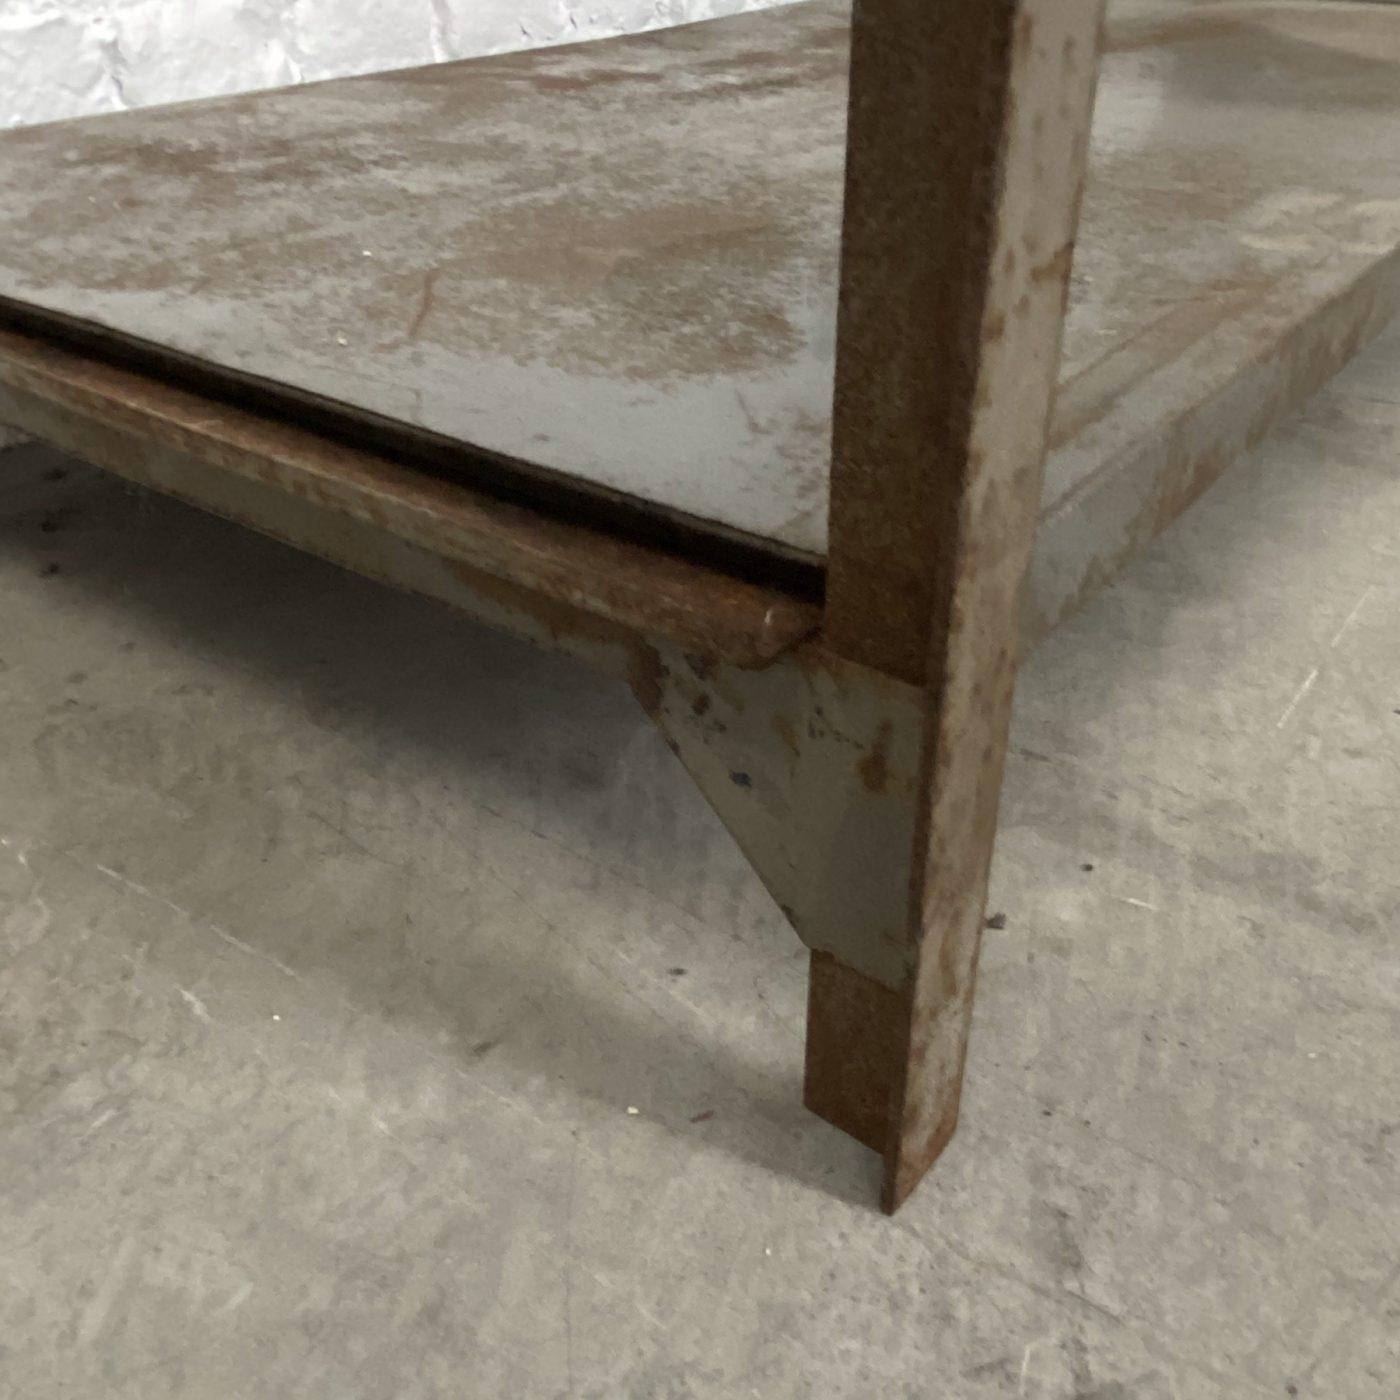 objet-vagabond-industrial-shelf0003